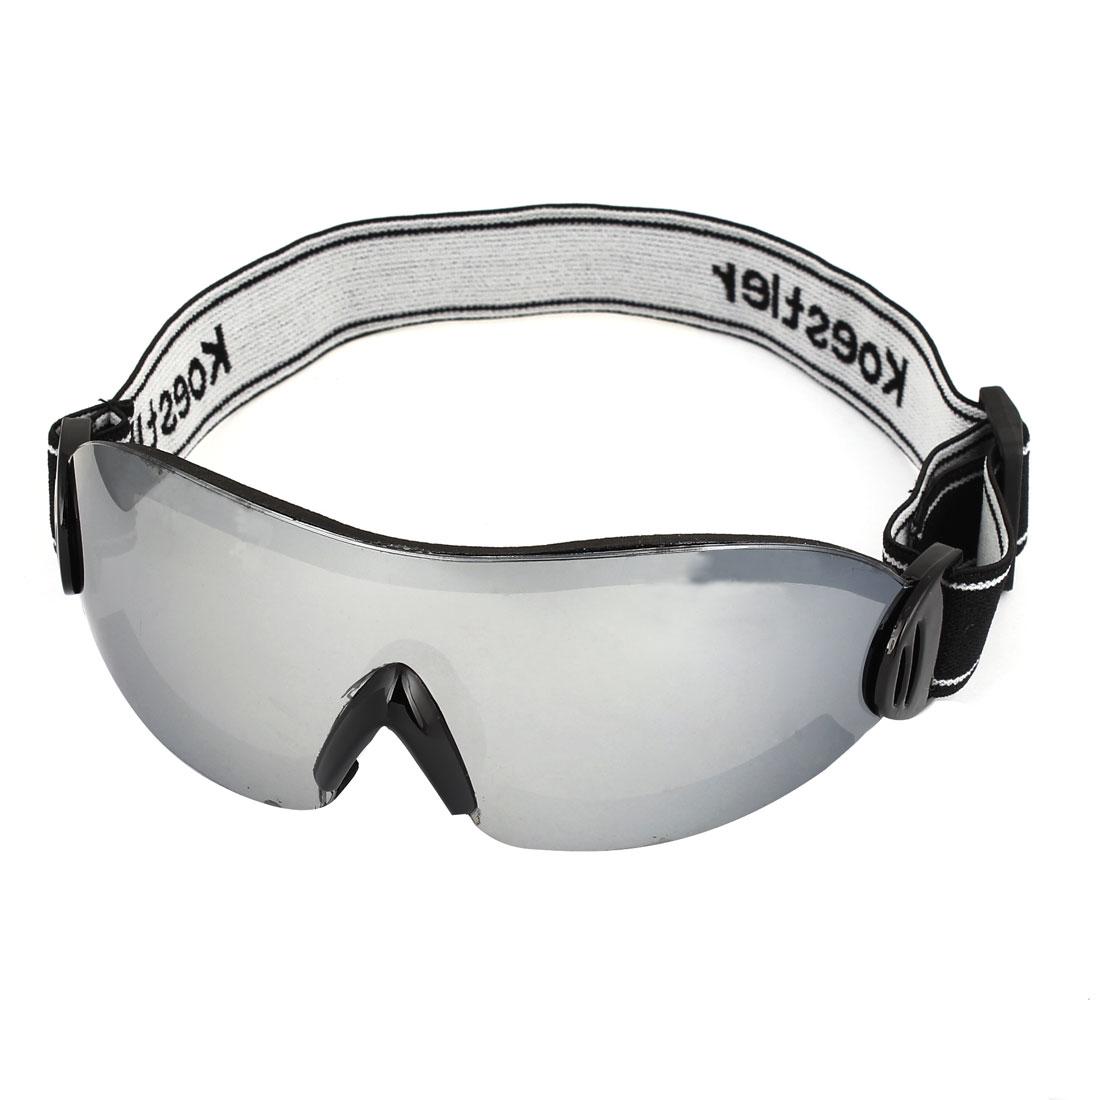 Unisex Elastic Strap Rimless Clear Lens Motorbike Snowboarding Goggles Glasses